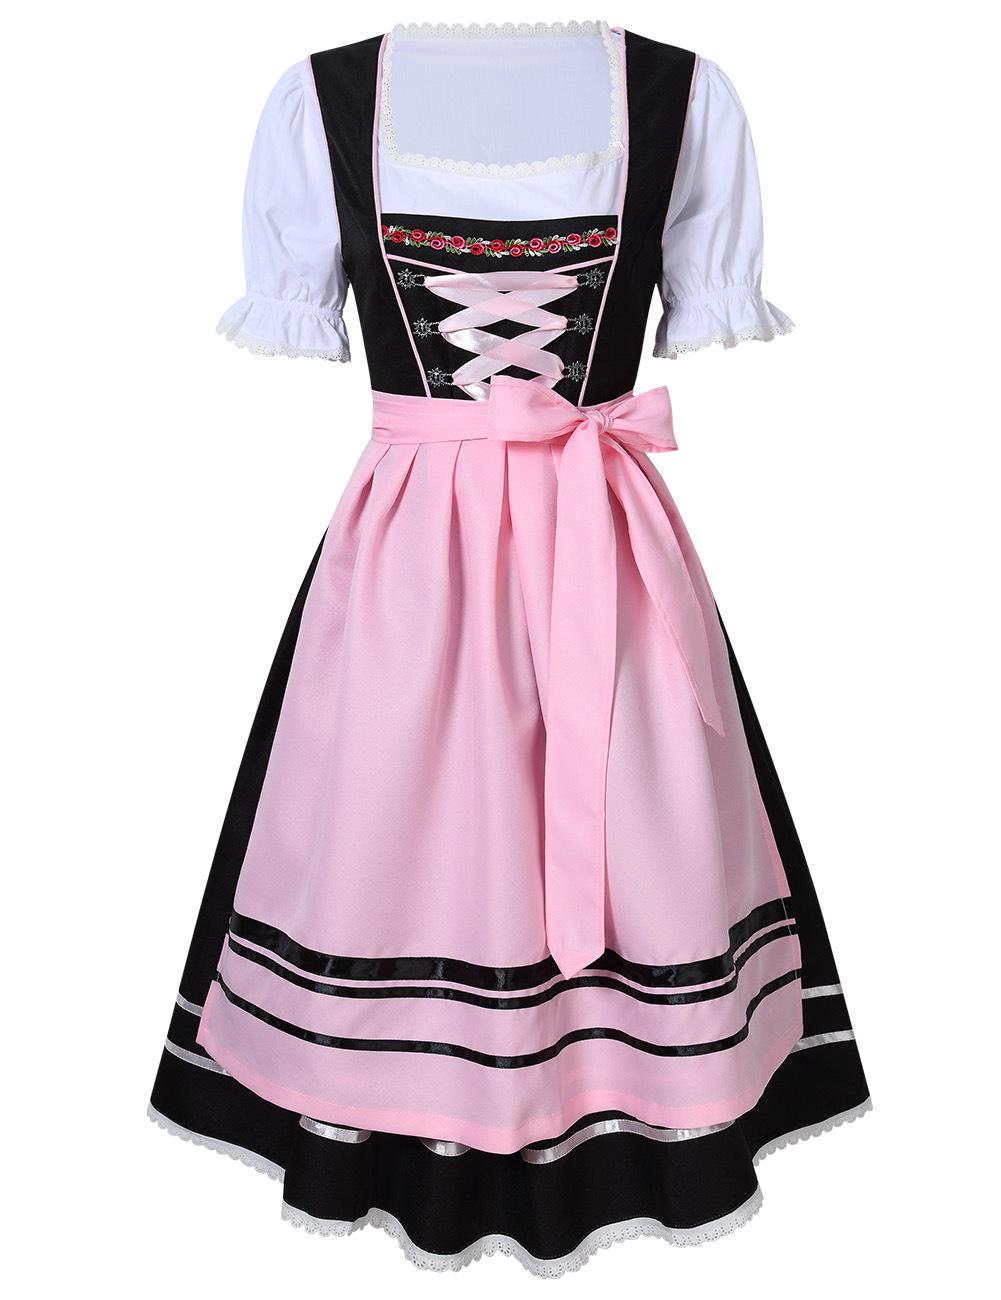 Female Bavarian Traditional Dirndl Dress Fastening Ties for Beer Festival  Pink/black_L